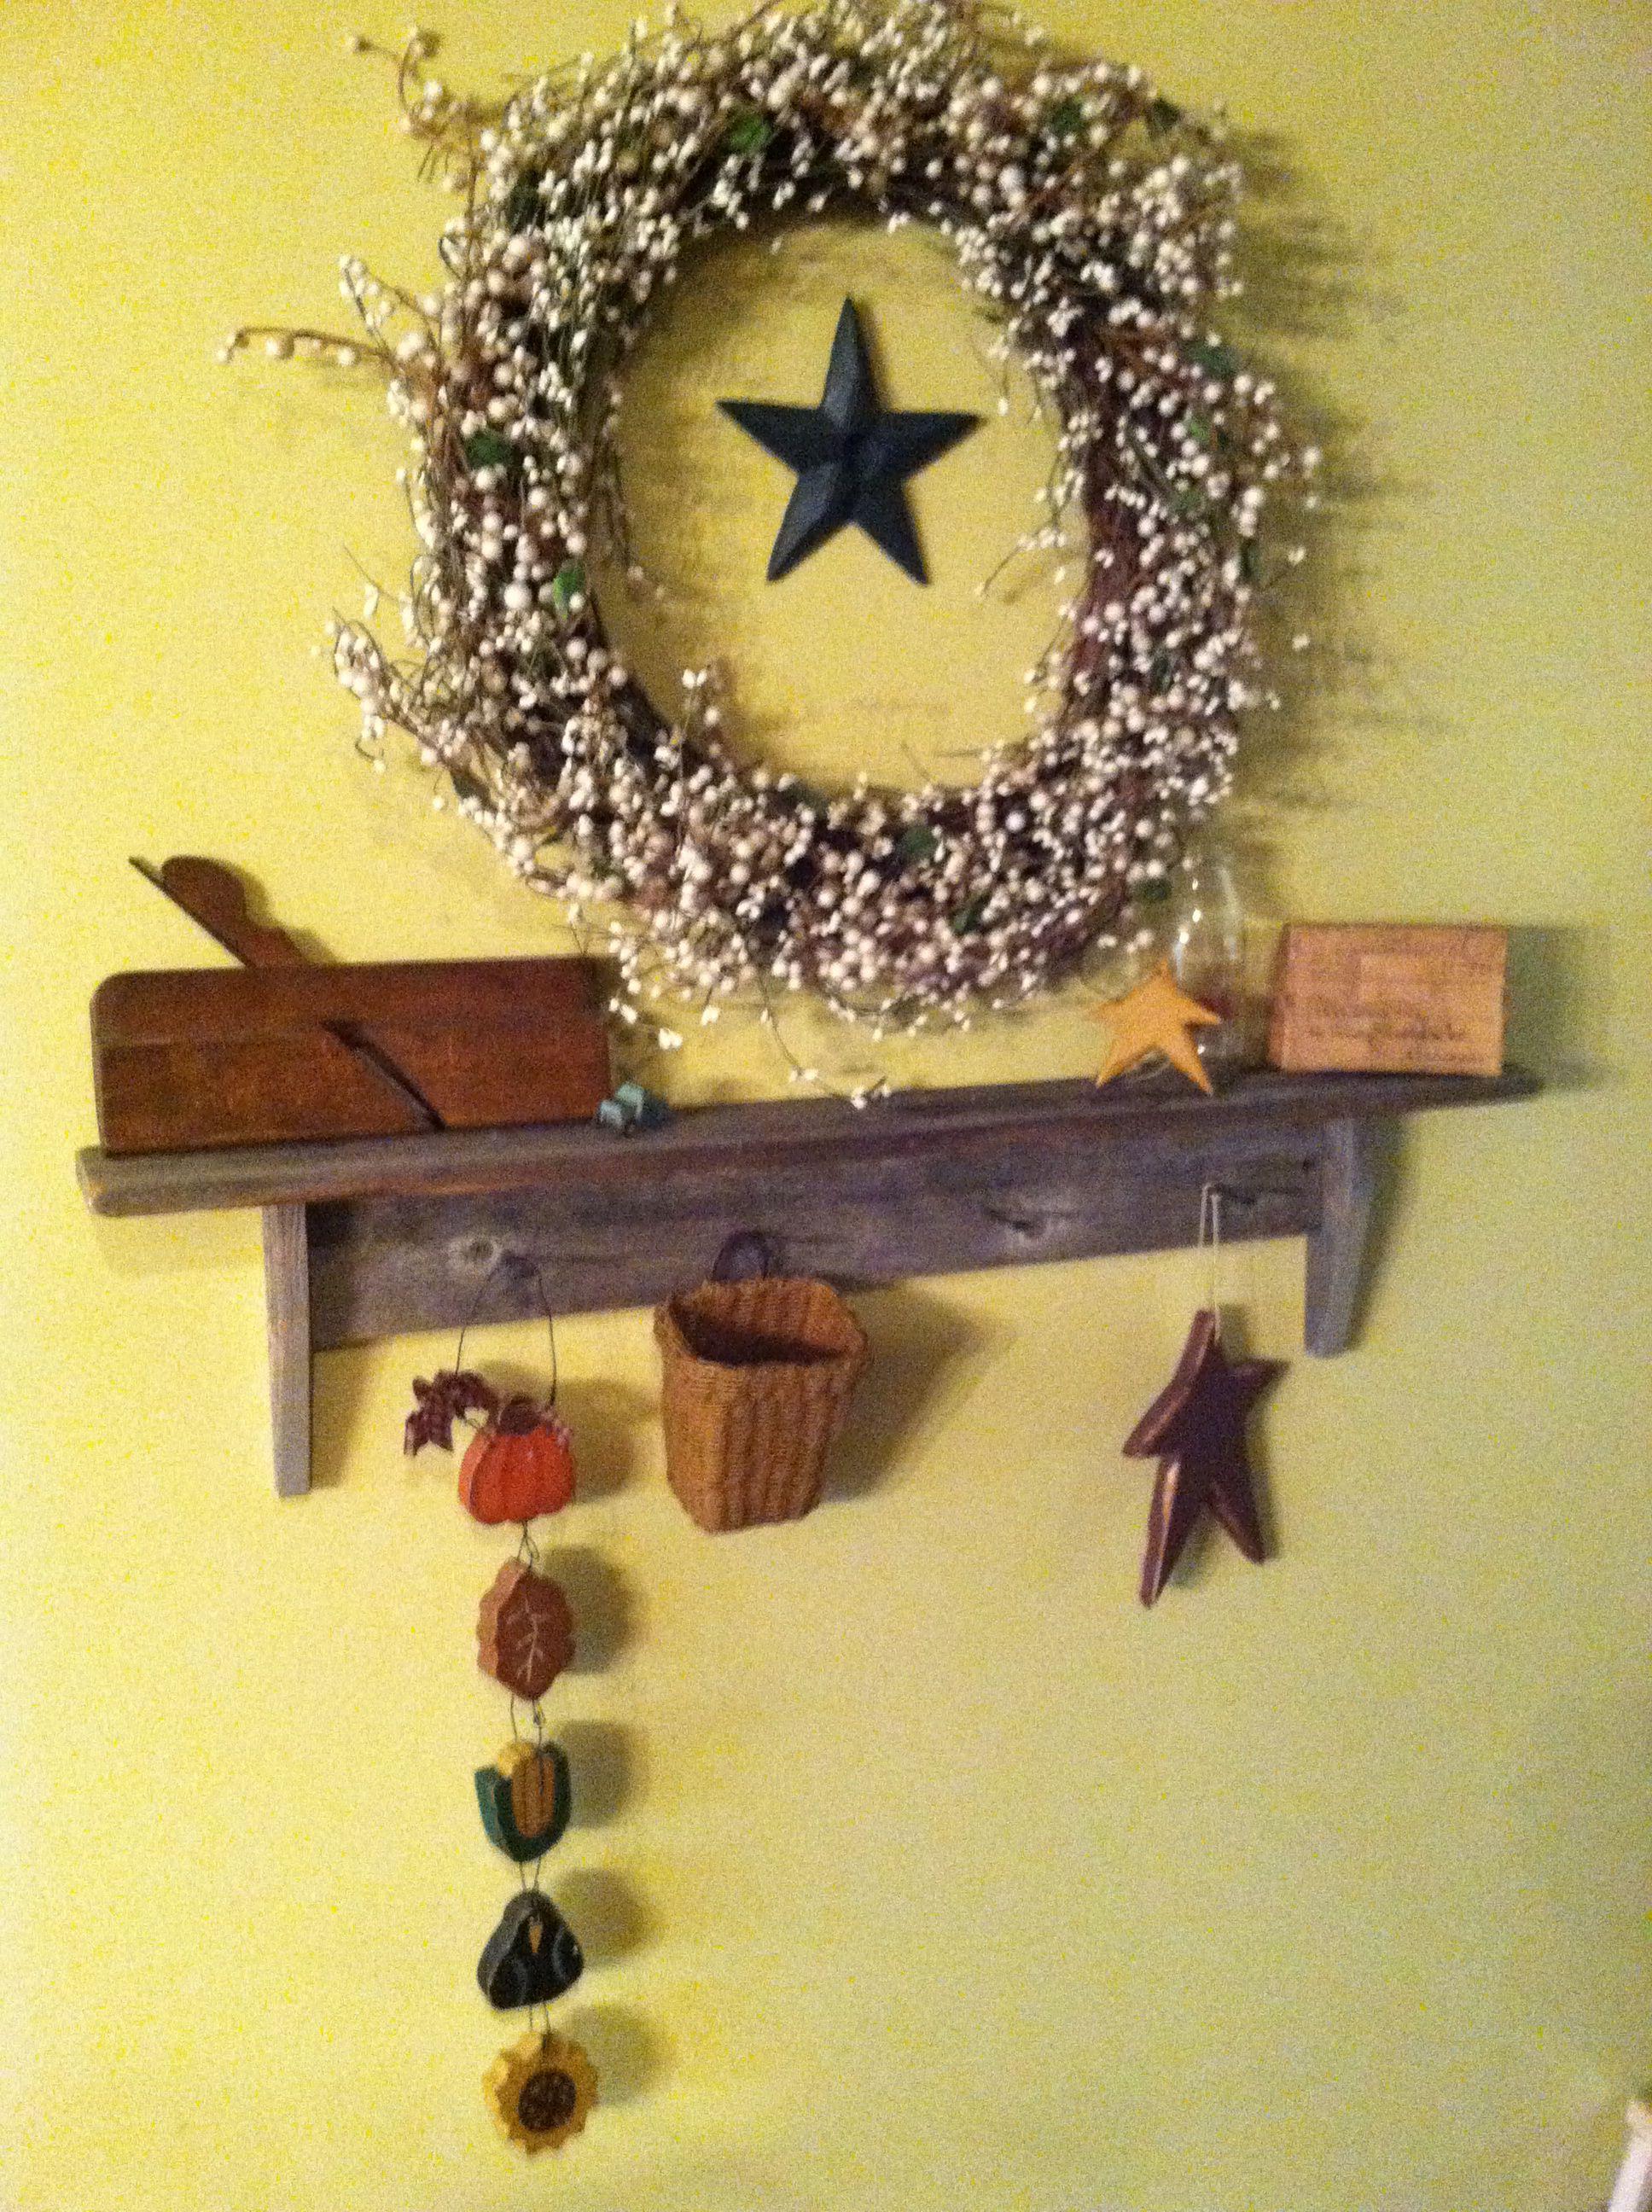 Shelf and wreath